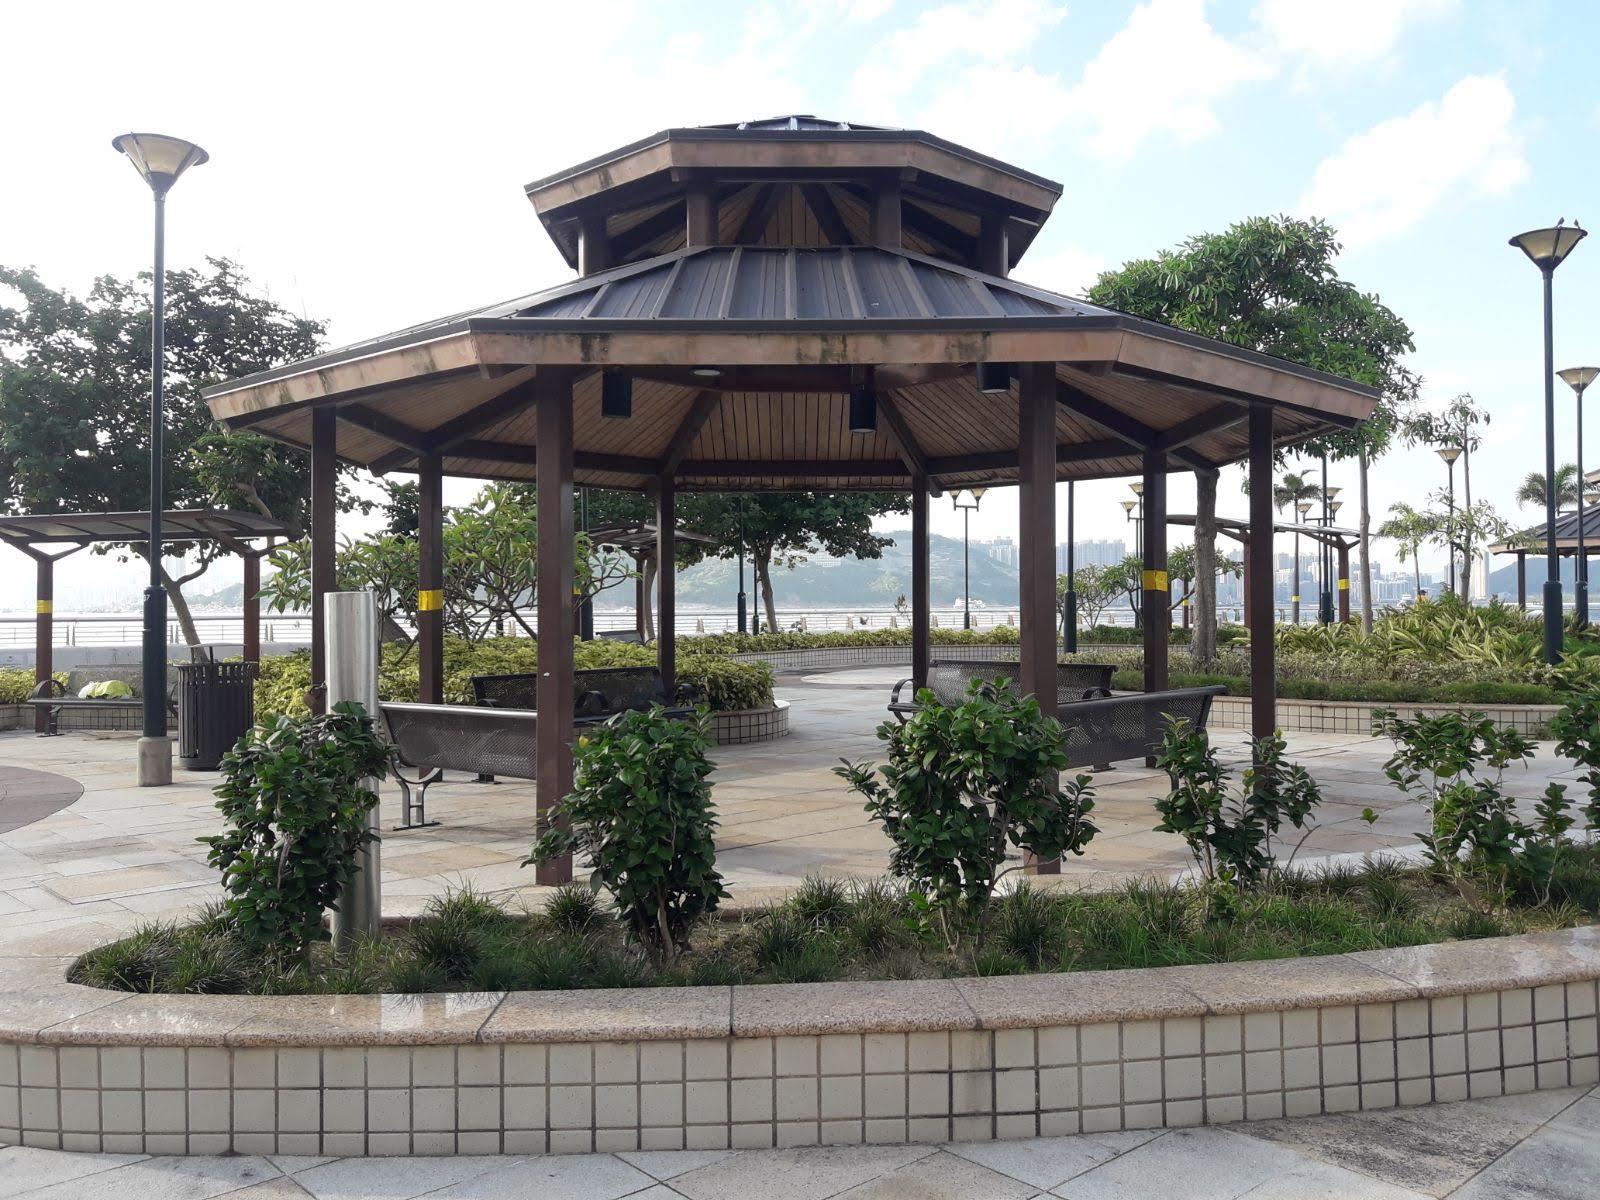 Siu Sai Wan Promenade's center part